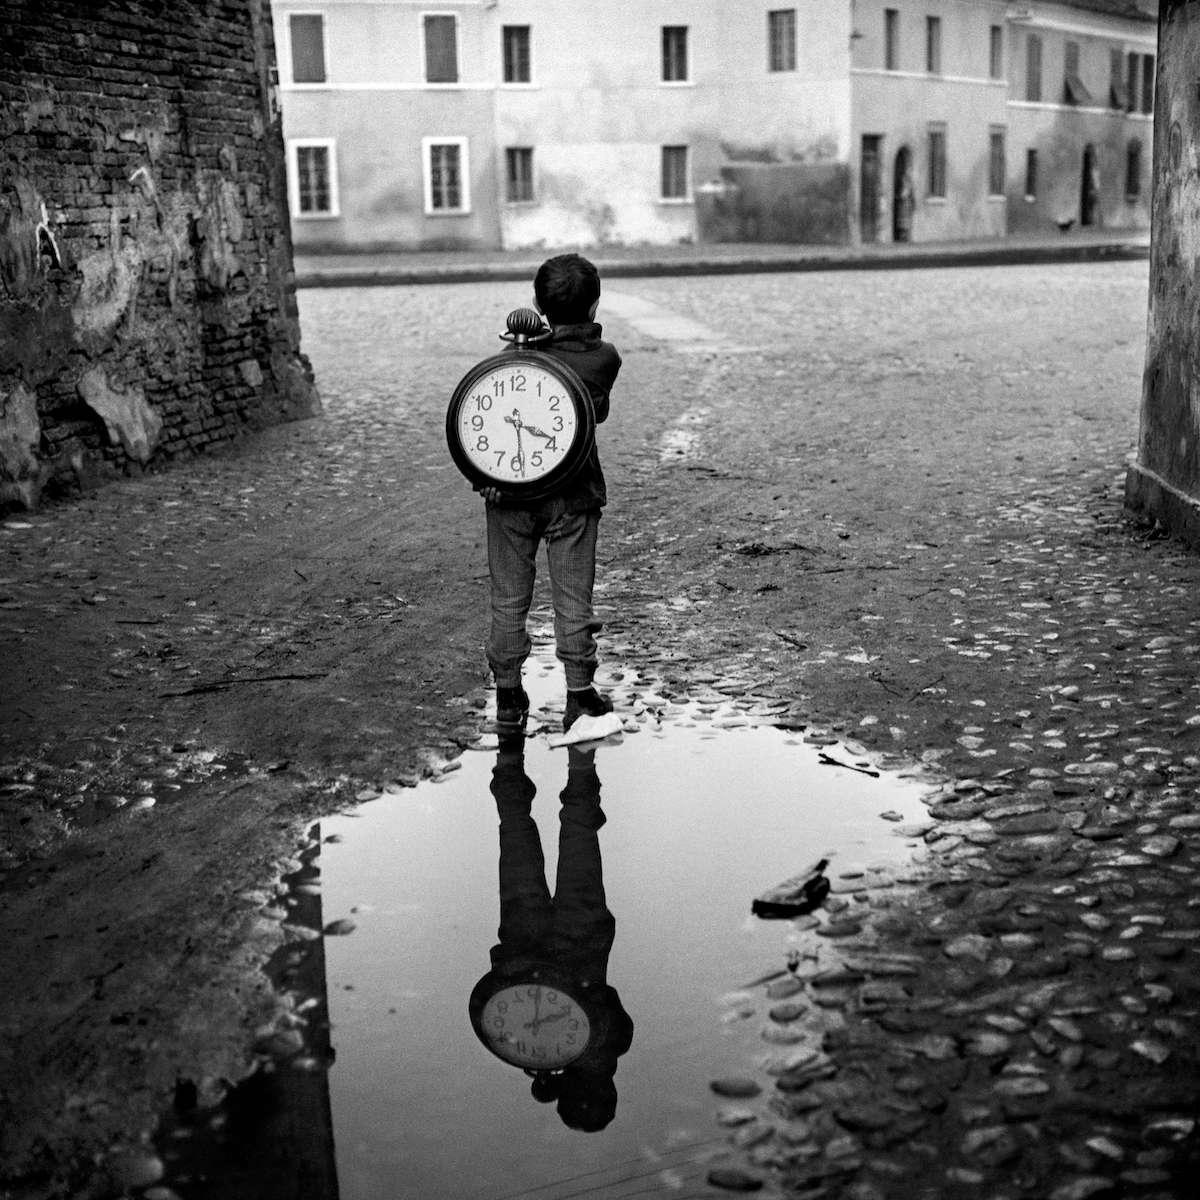 Piergiorgio Branzi post-war Italy photography